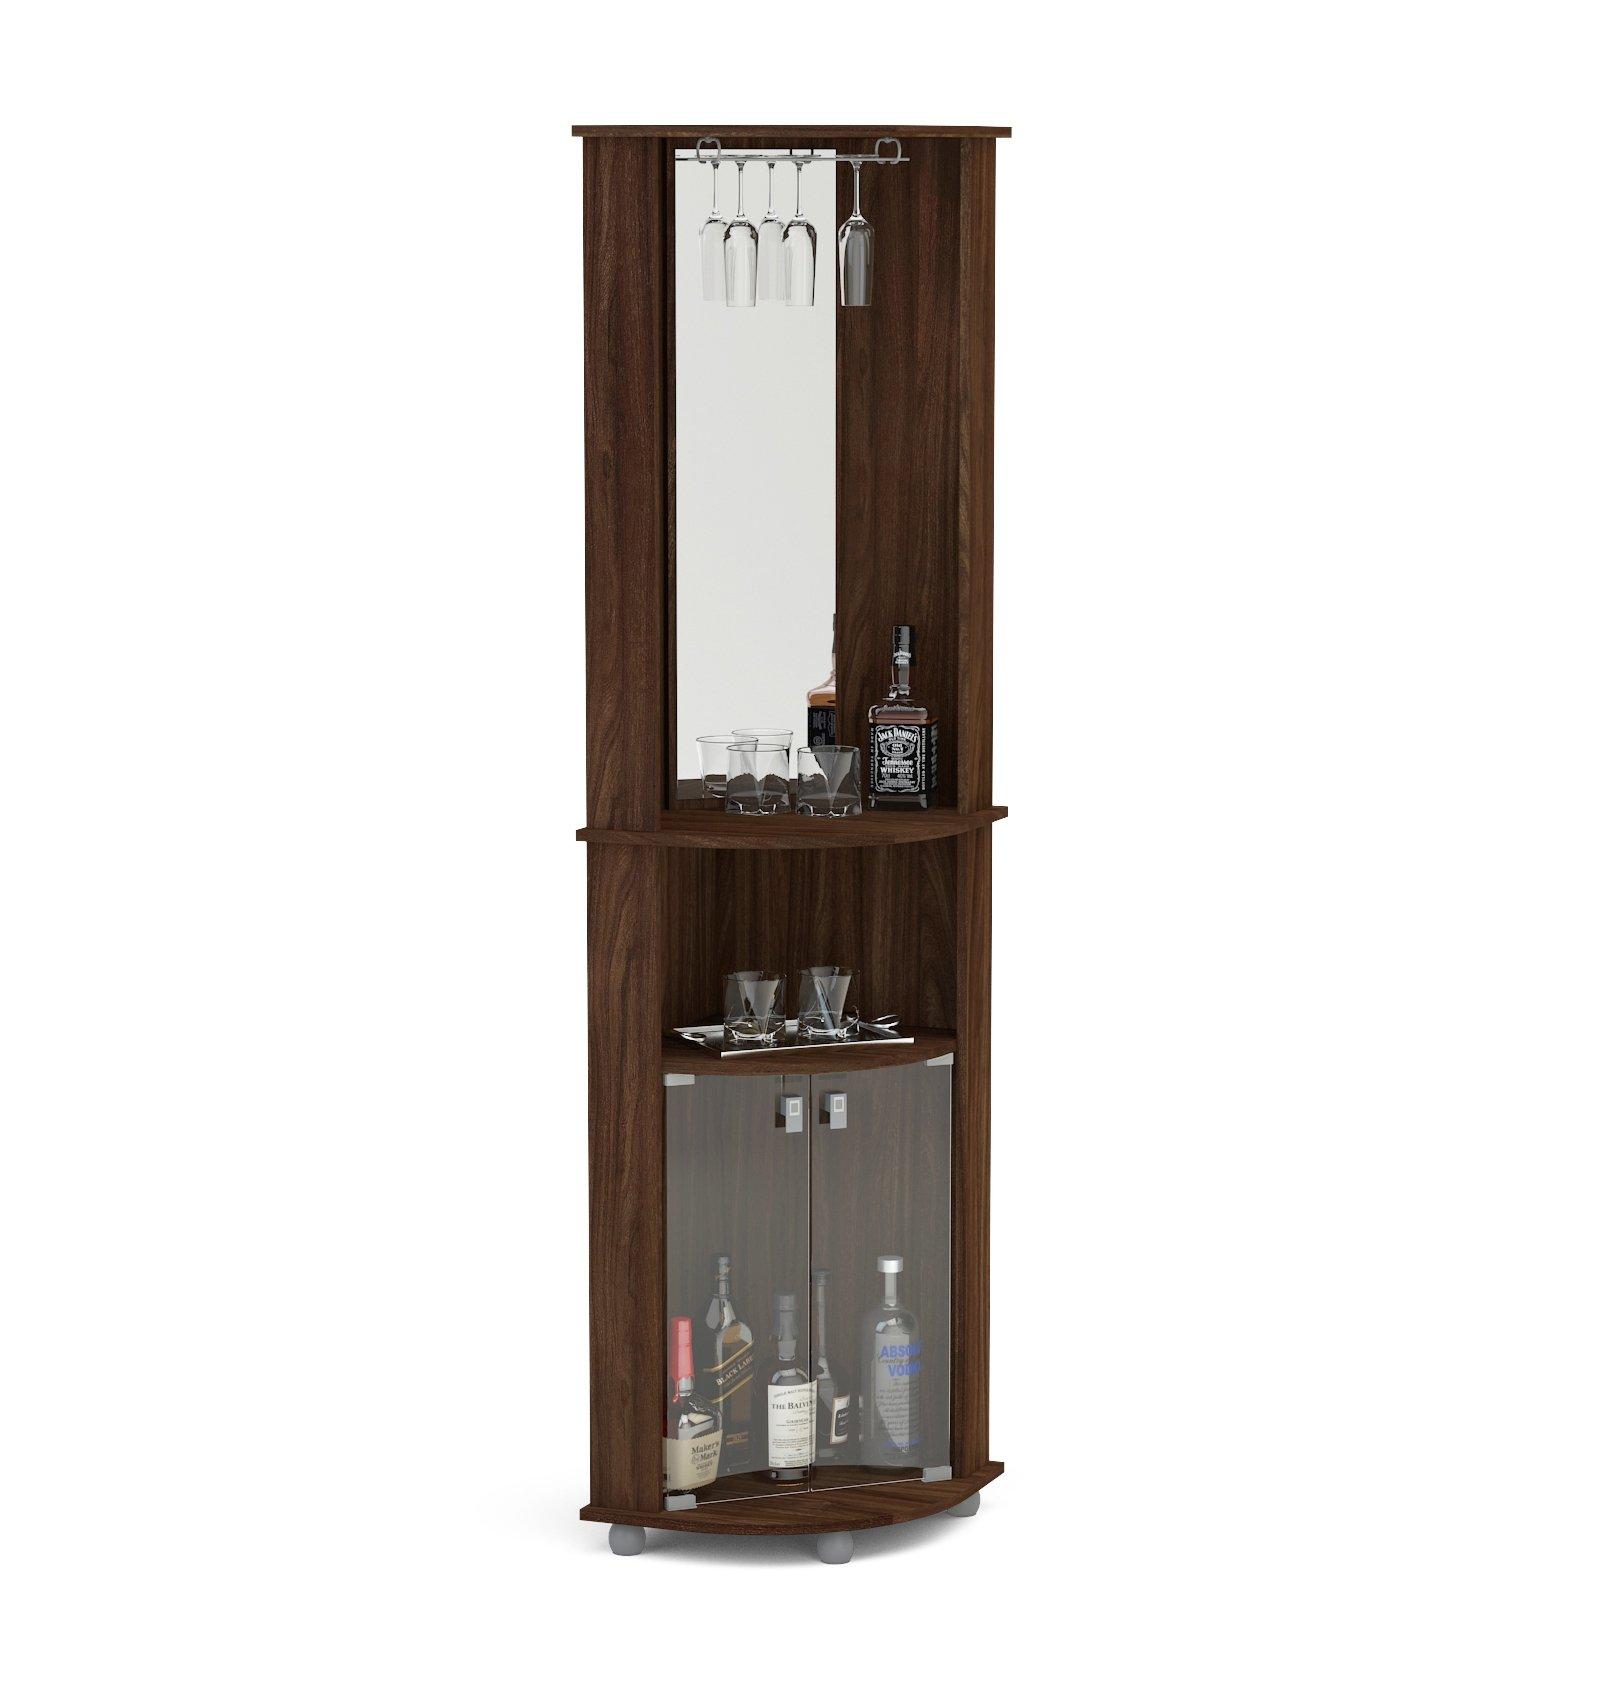 Boahaus Corner Bar, 2 Glass Door, Mirrowed Wall, Glass Rack Dark Brown/Wood by Boahaus